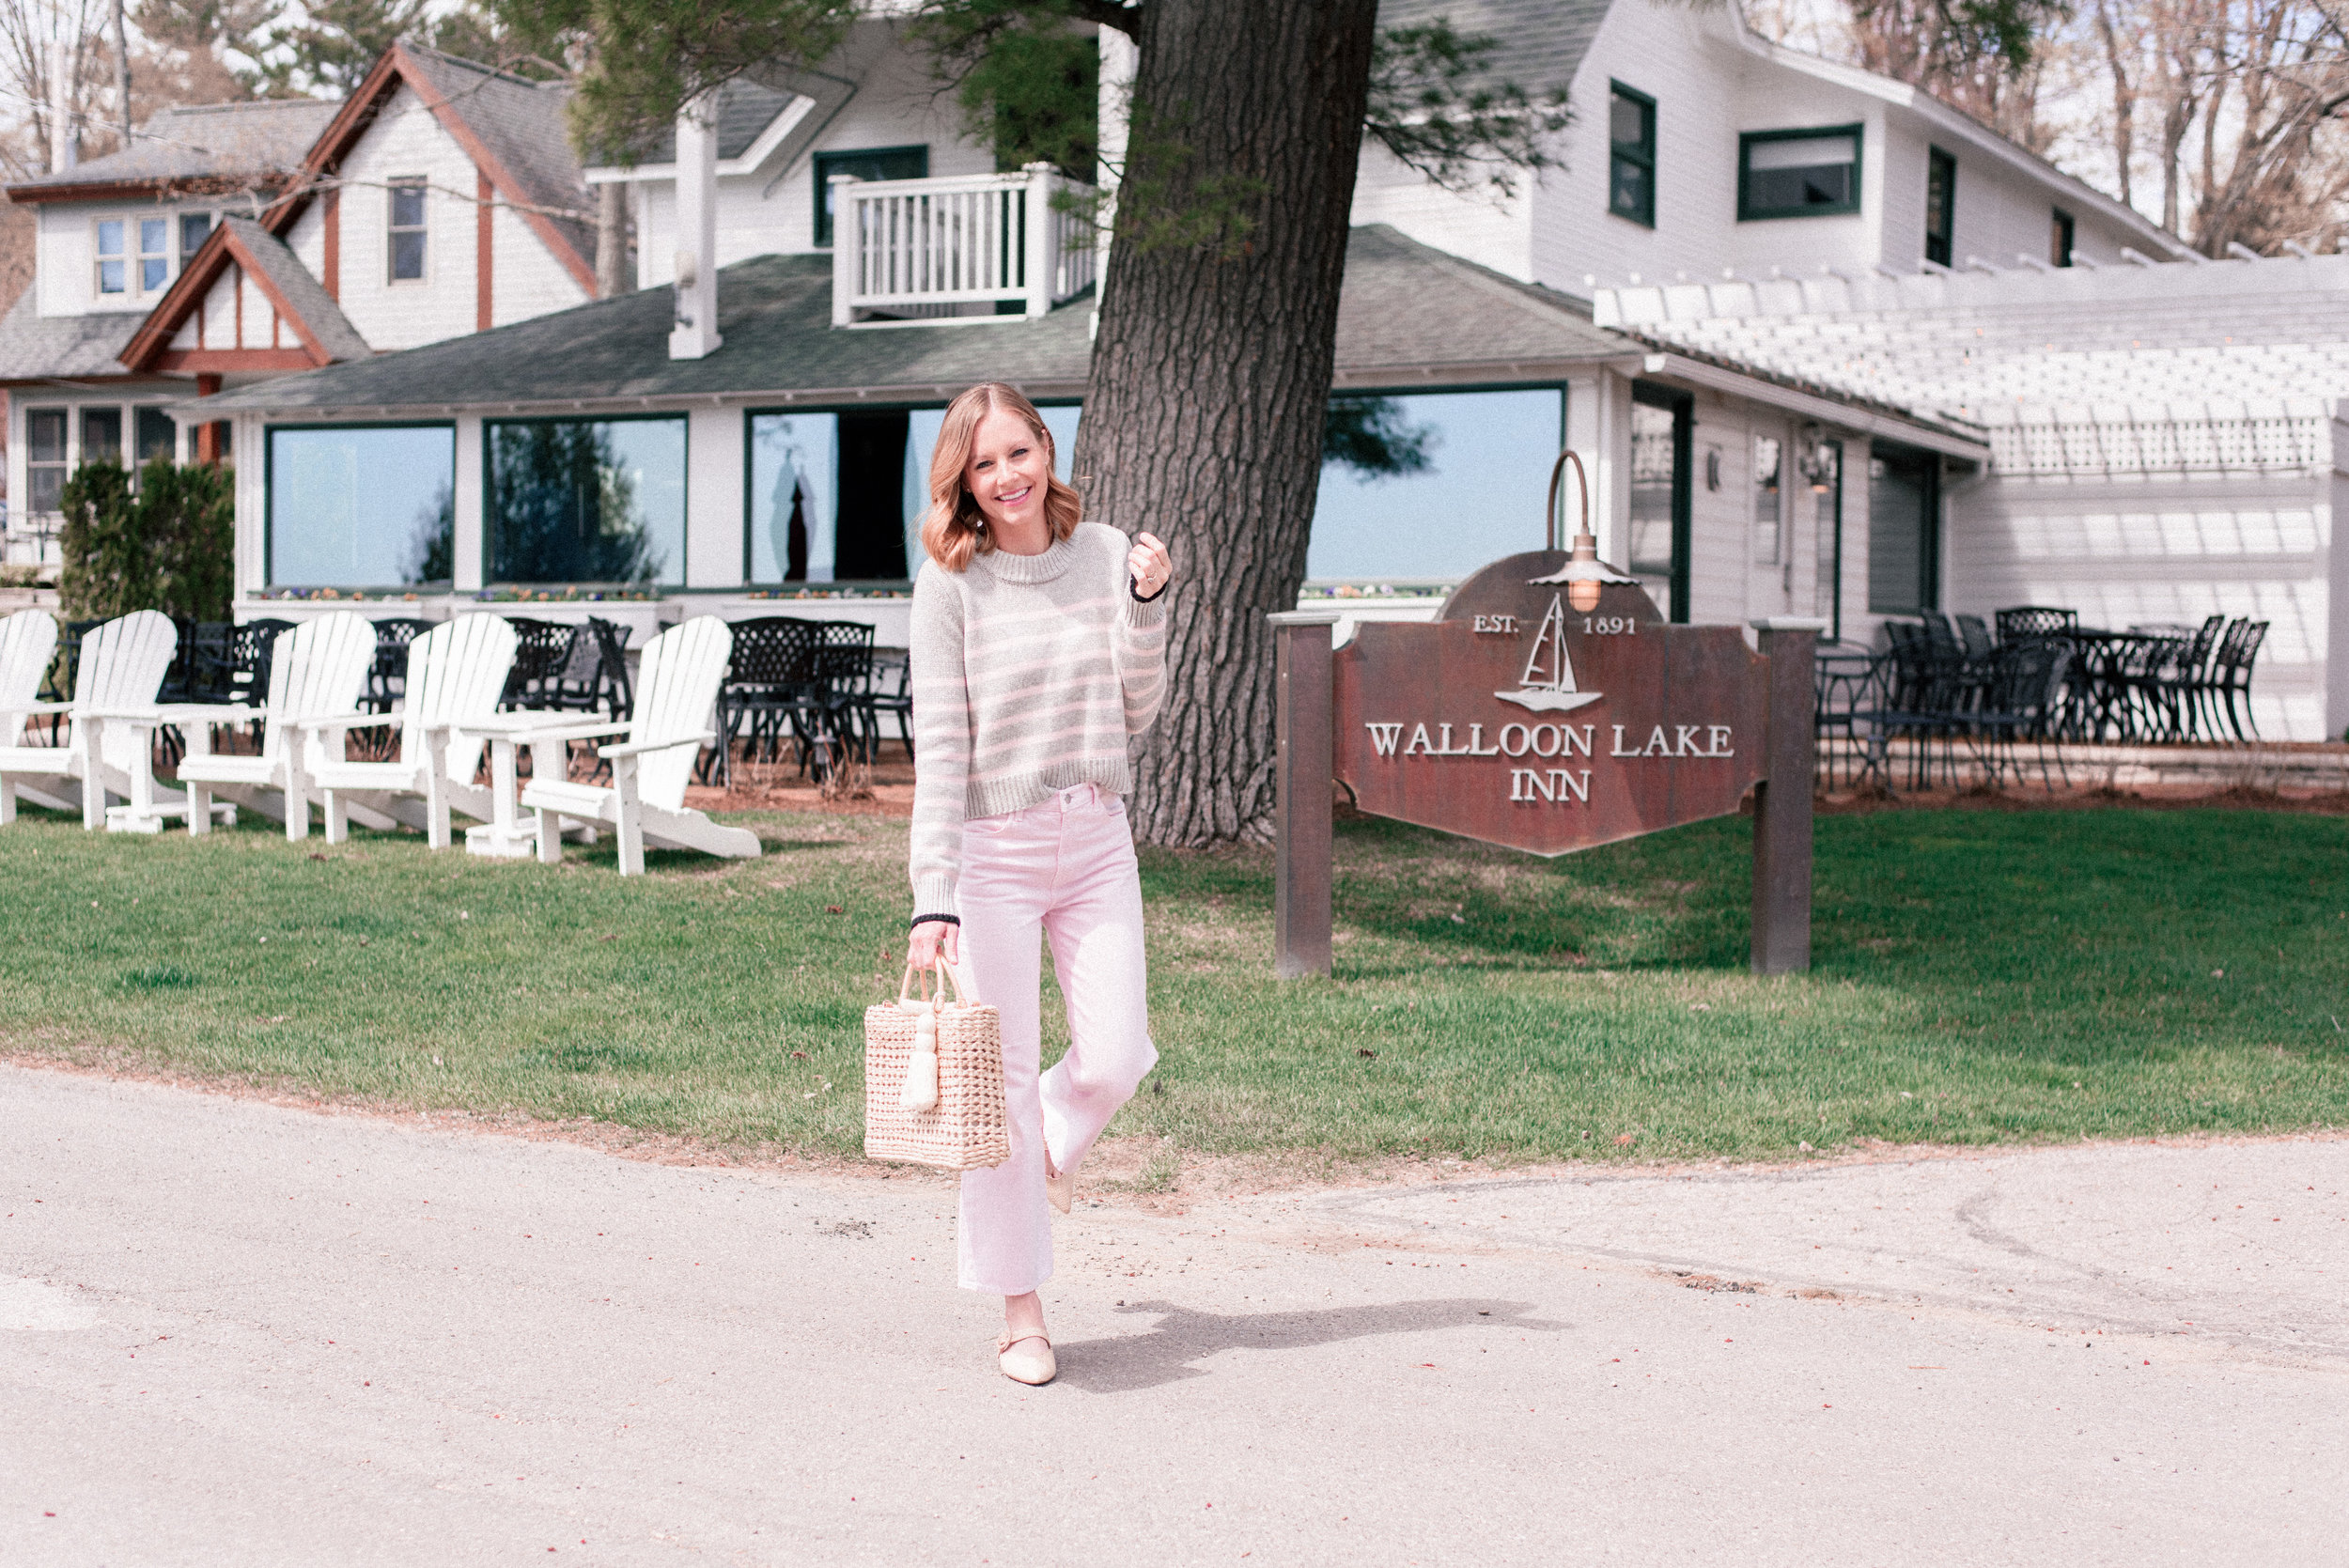 michigan-best-restaurants-the-walloon-lake-inn-3.jpg